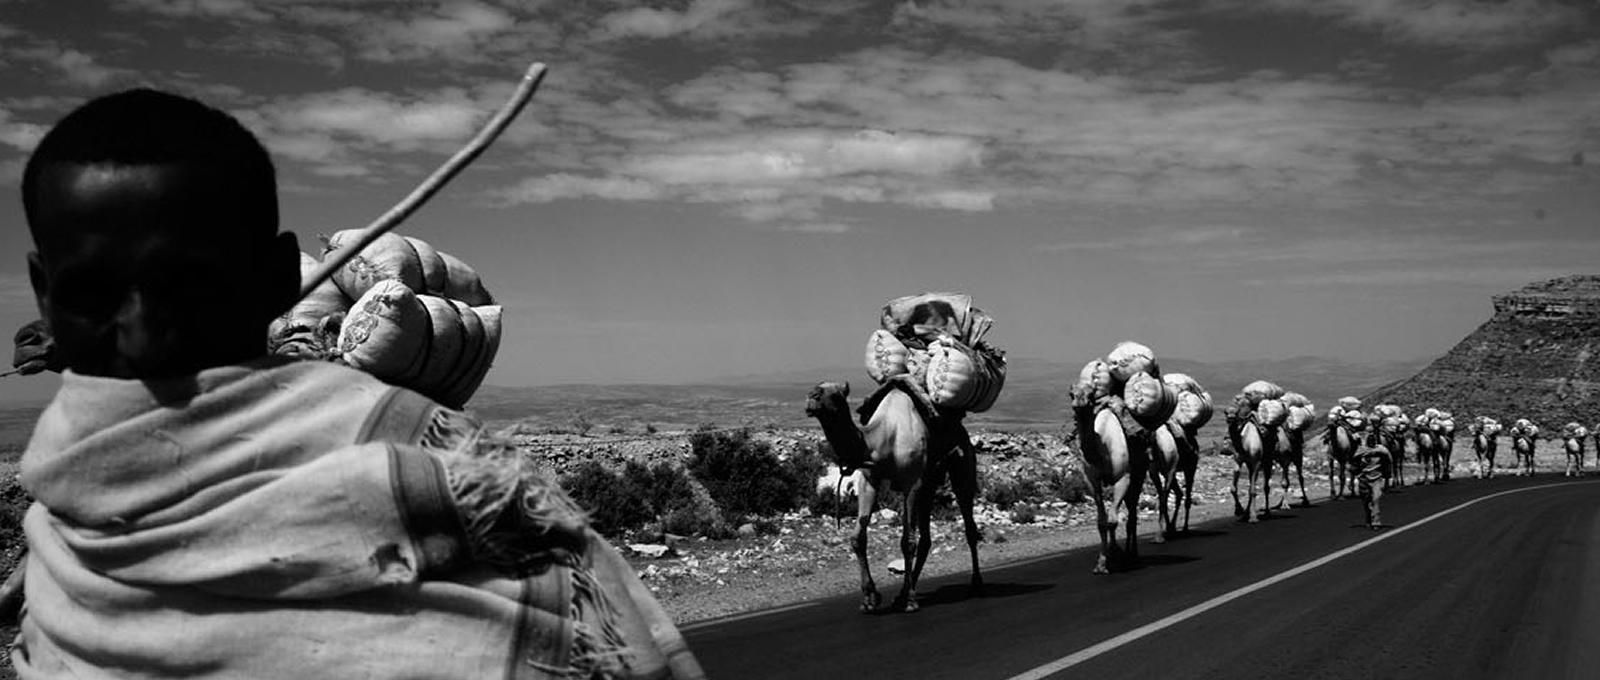 Camel caravan, Afar